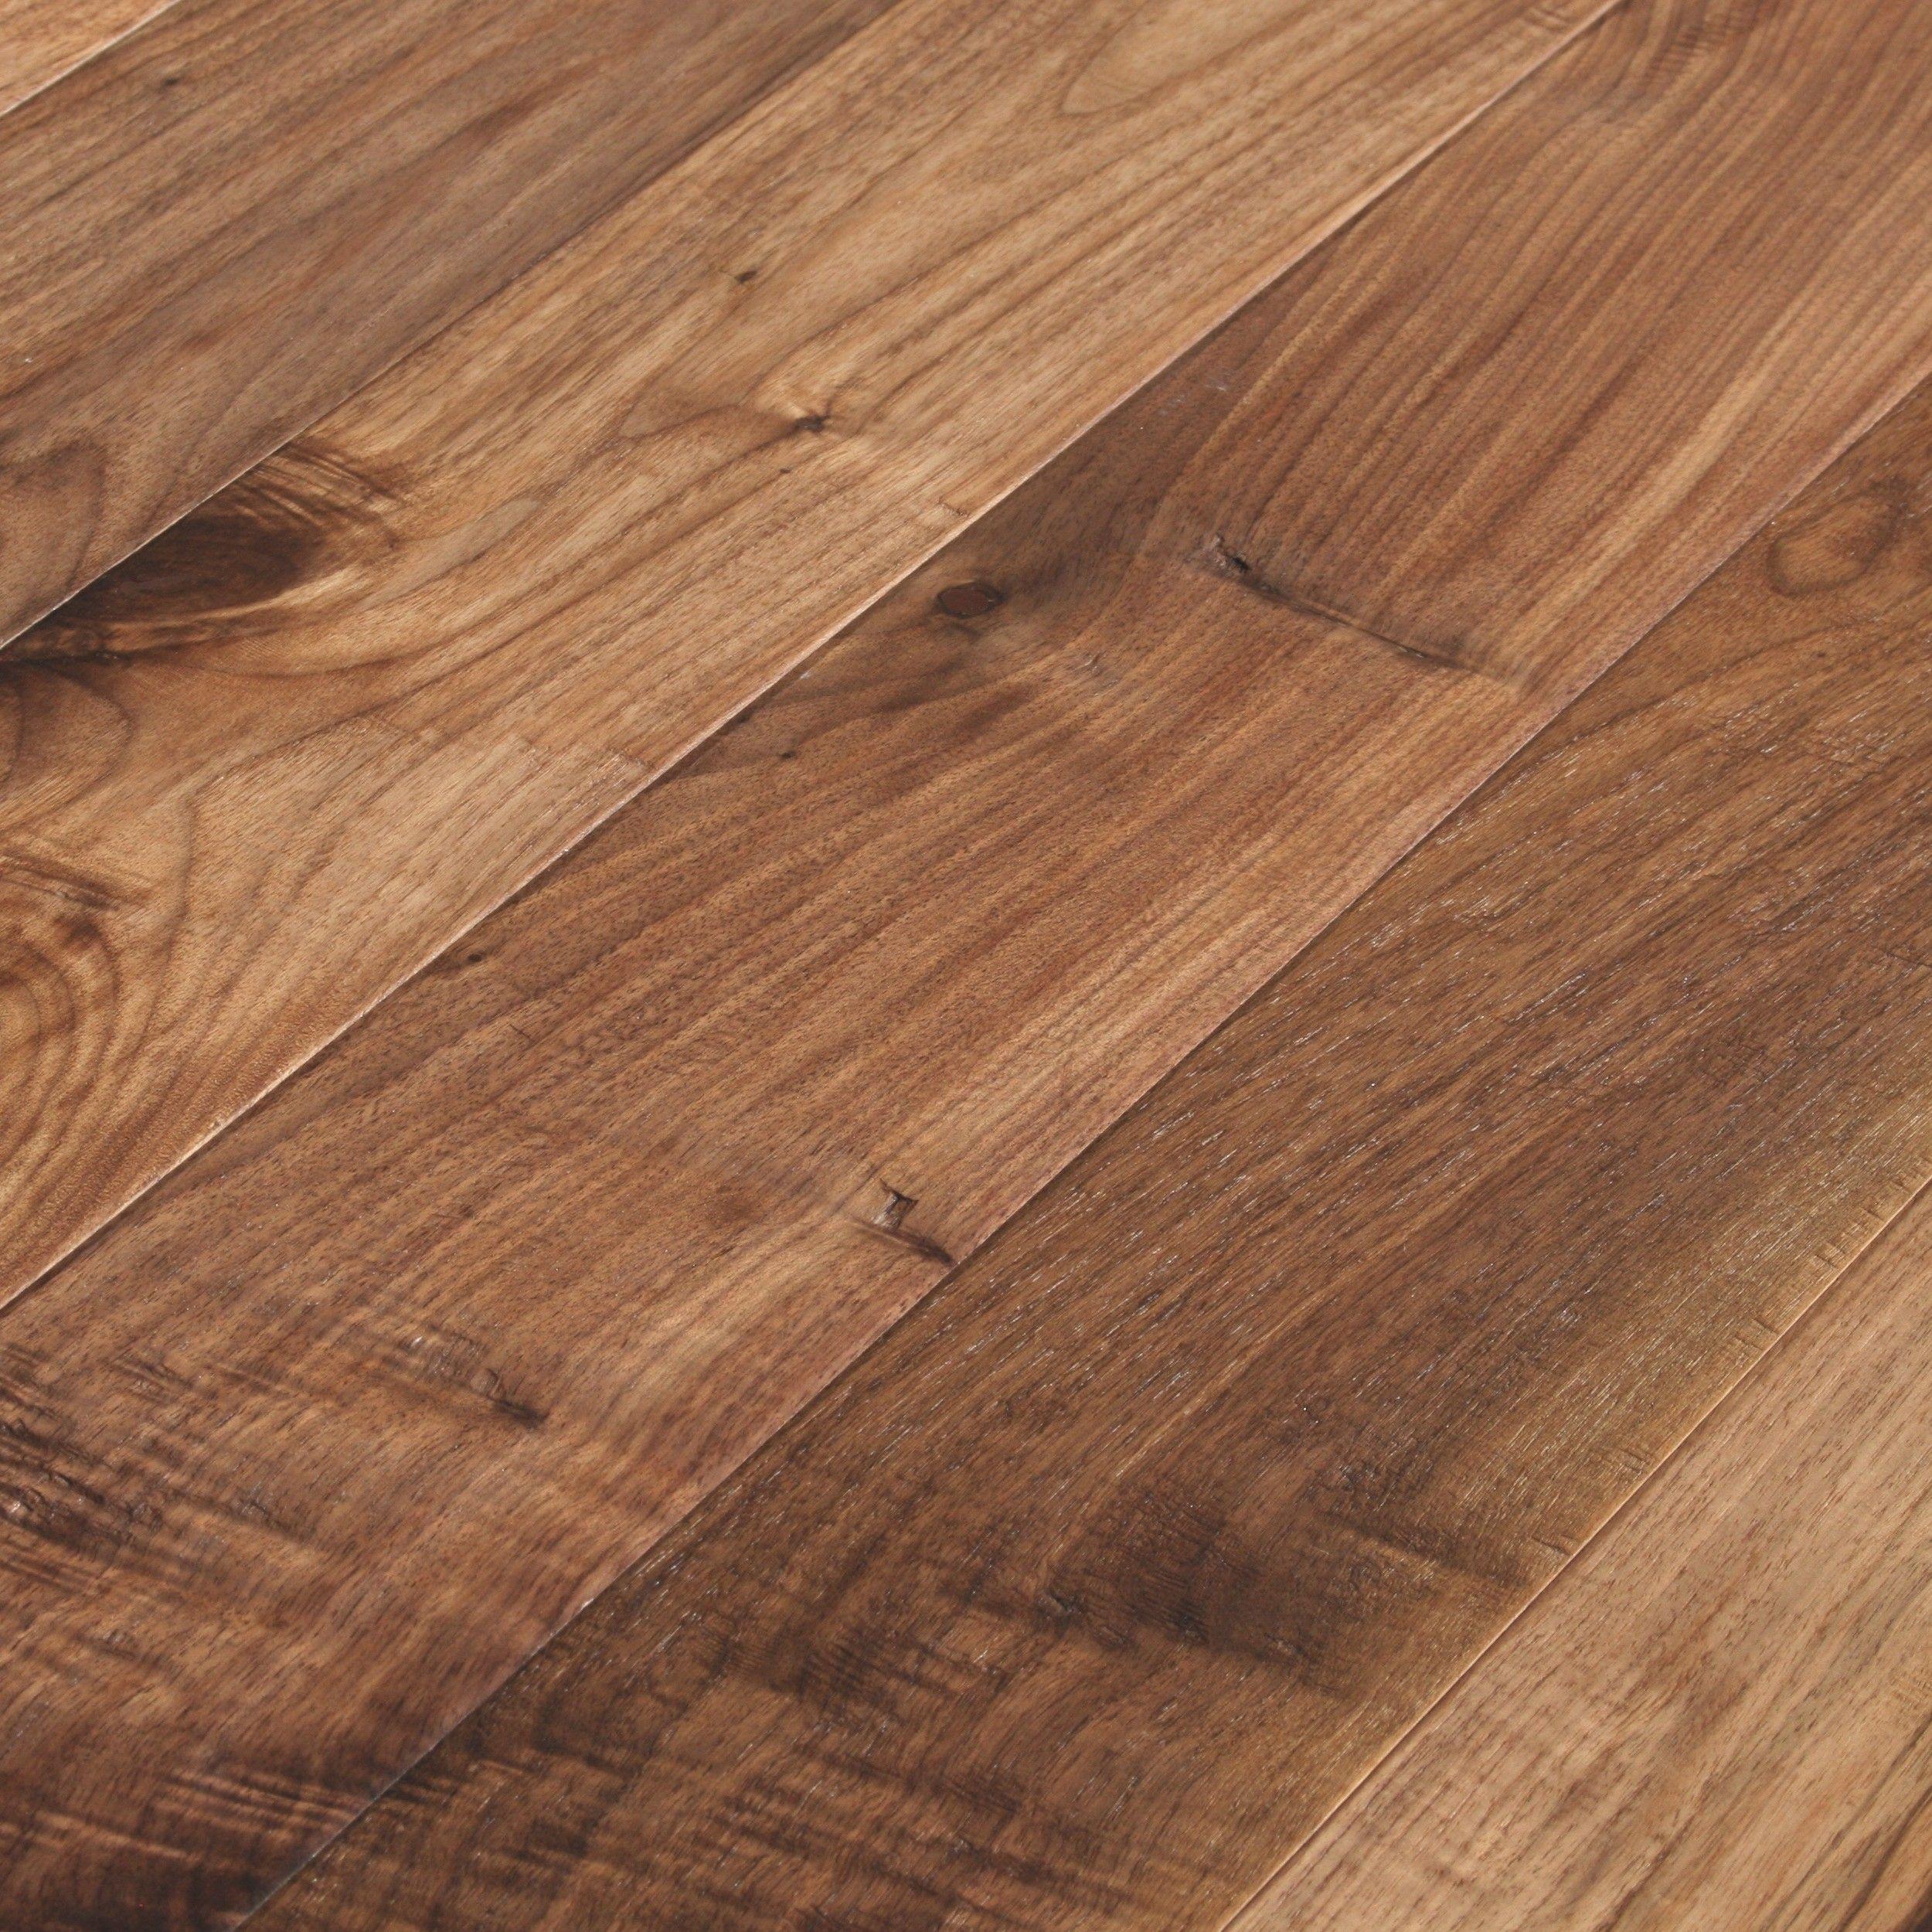 Millennium Walnut Oiled Natural Hand Scraped Flooring